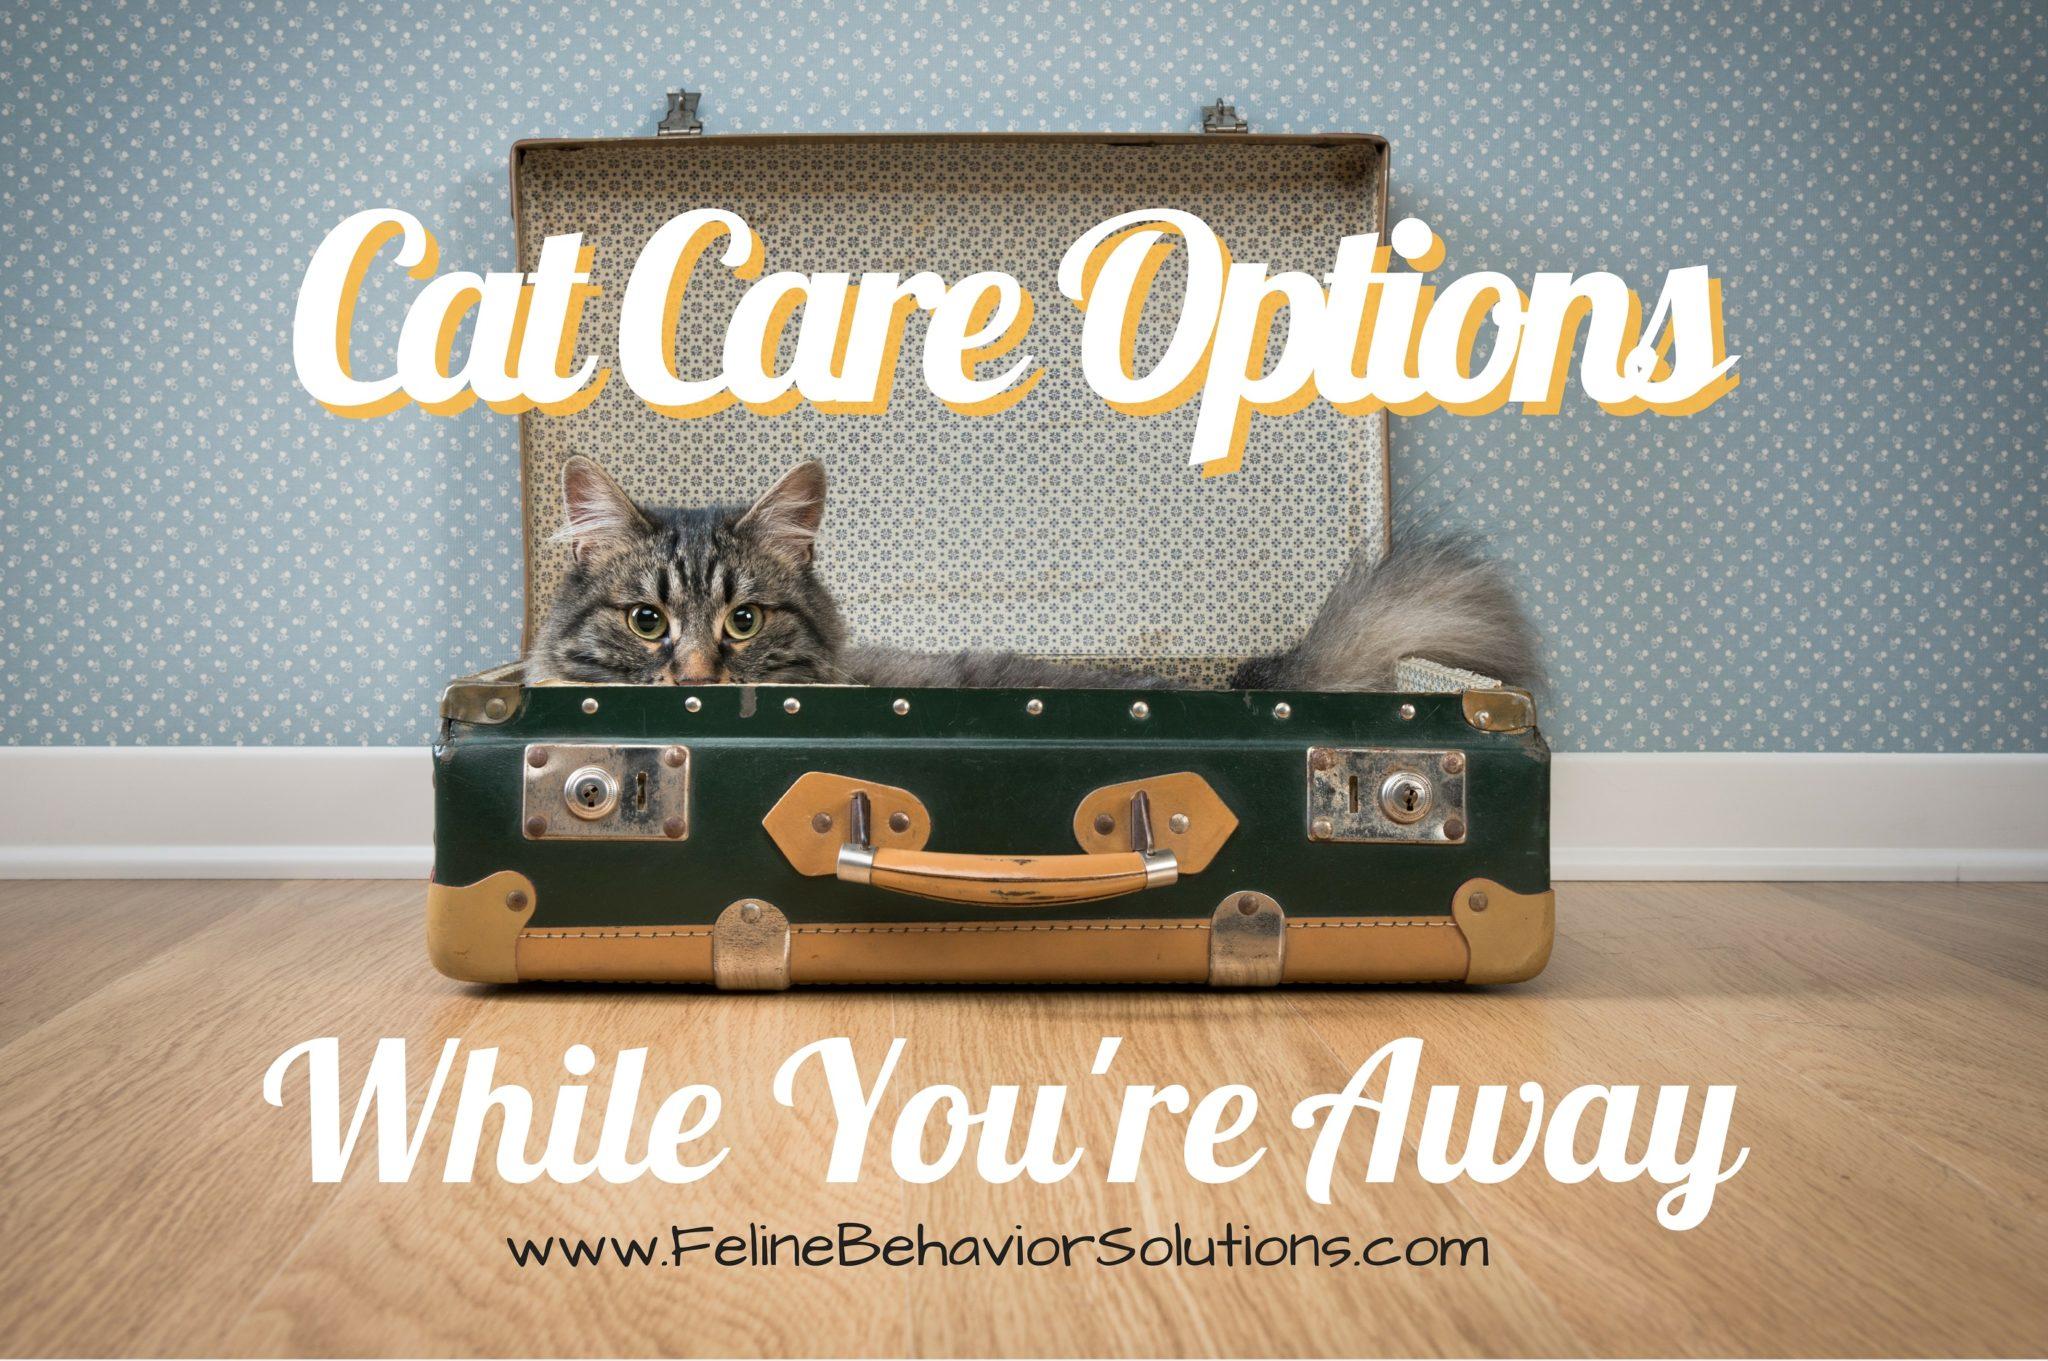 Cat Care Options